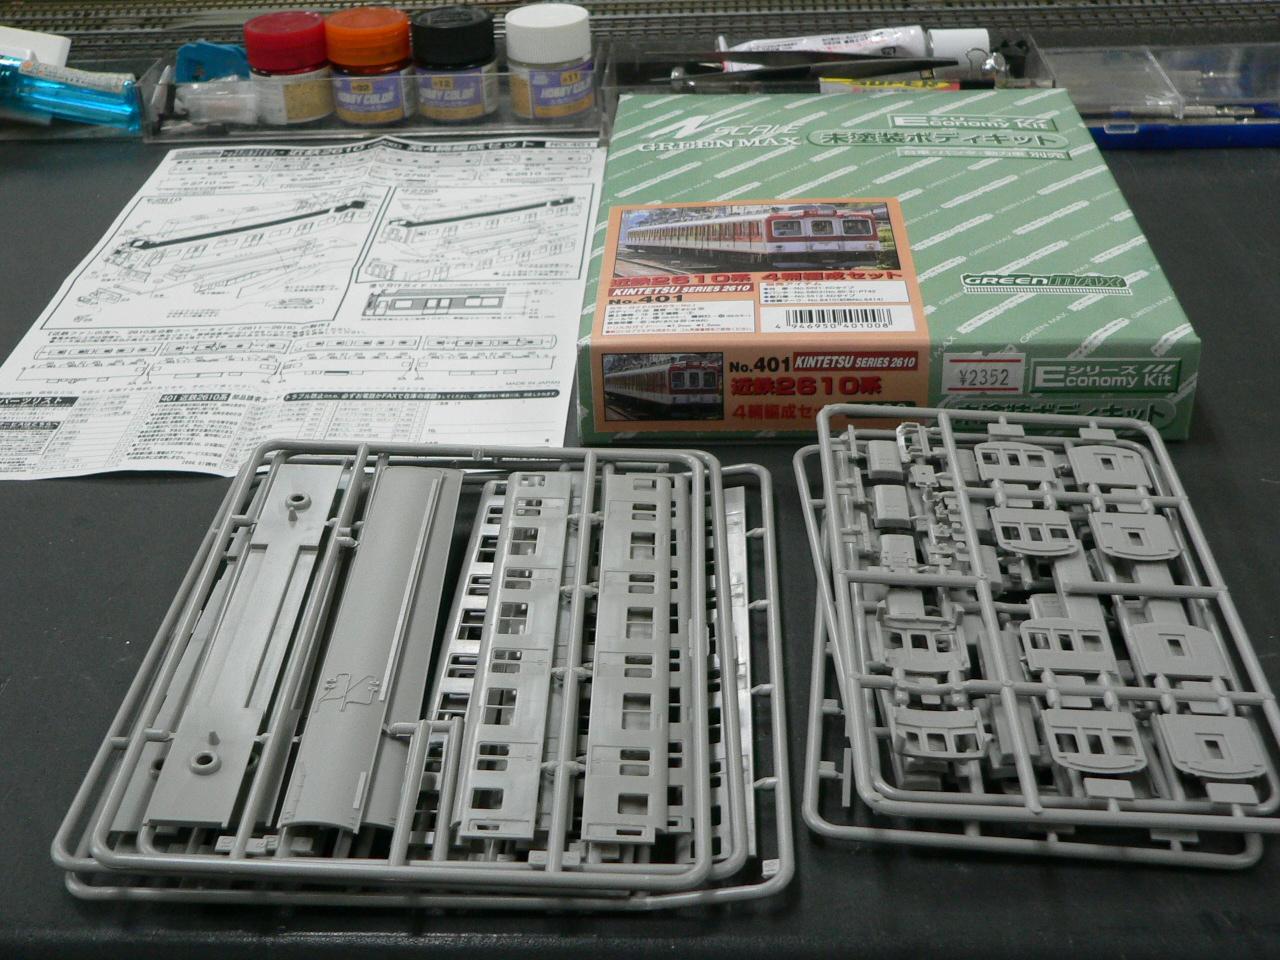 http://mokei-ya.cocolog-nifty.com/photos/uncategorized/2010/05/23/p1140155.jpg